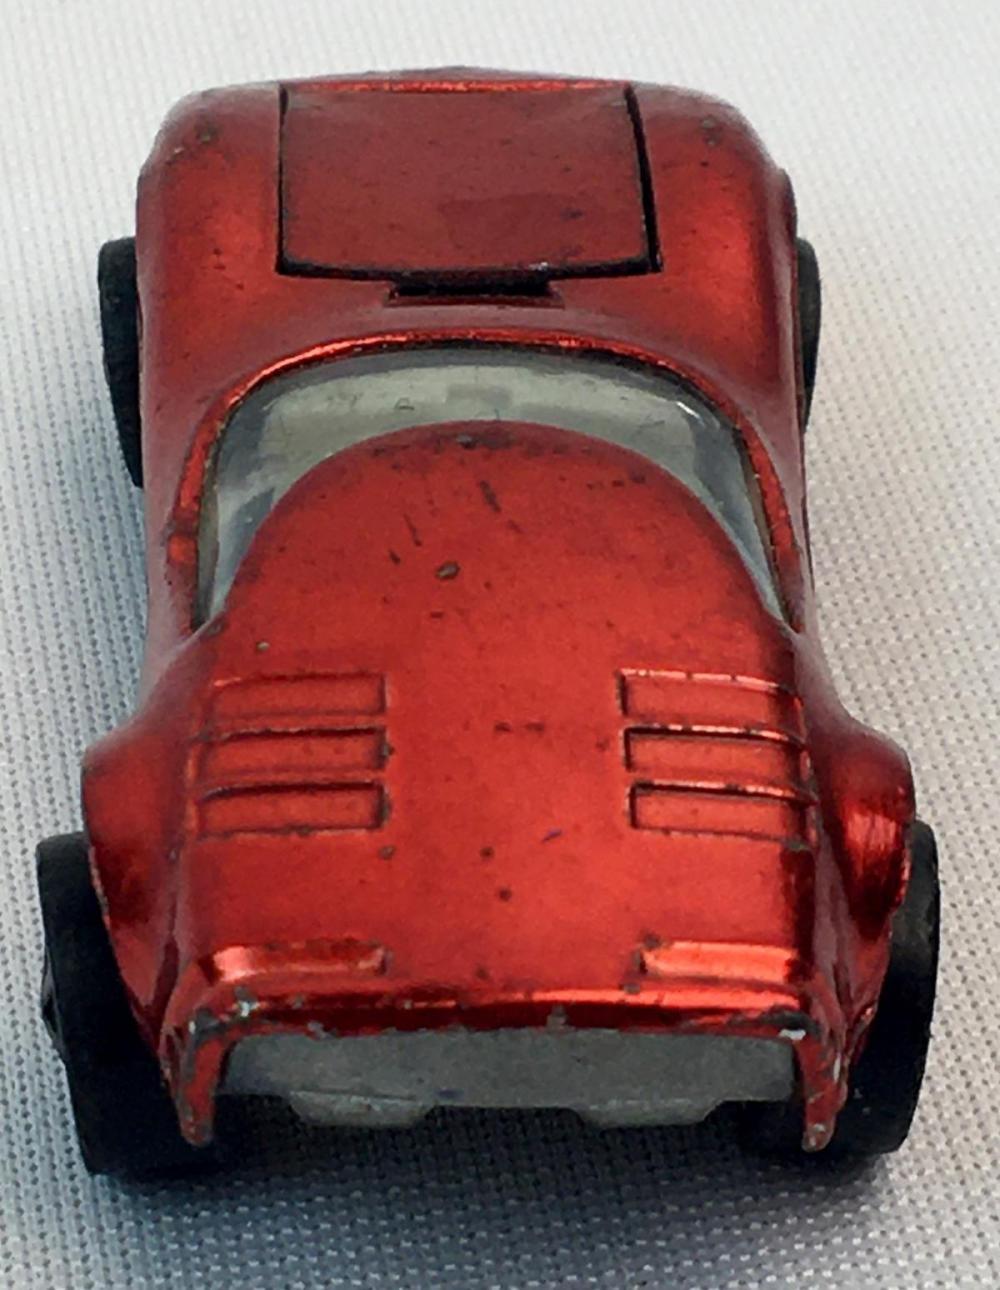 Vintage 1968 Hot Wheels Redline Red Torero